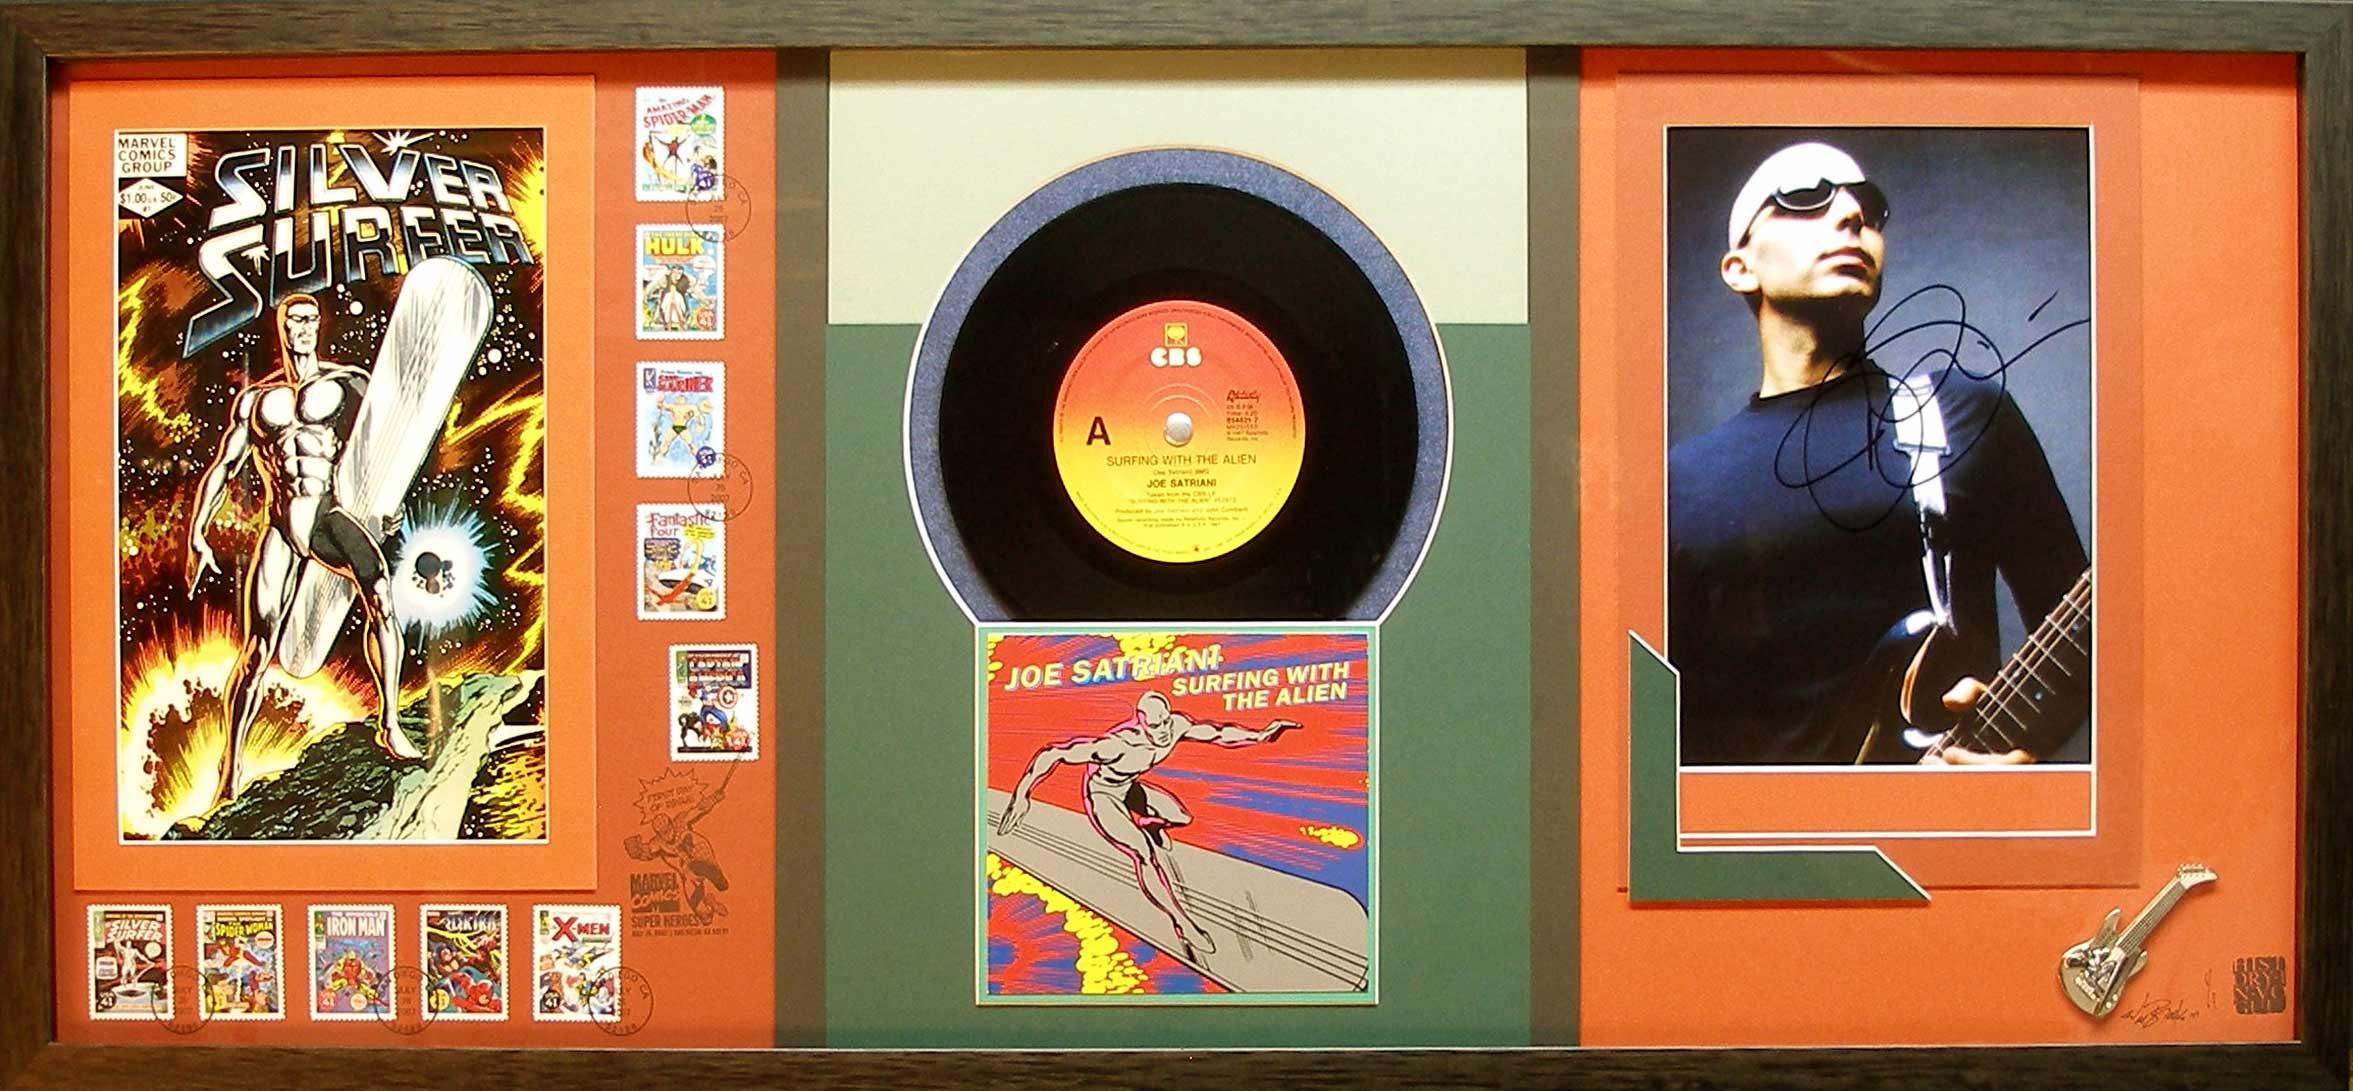 This custom encompasses more than 27 years of Silver Surfer and Joe Satriani history...